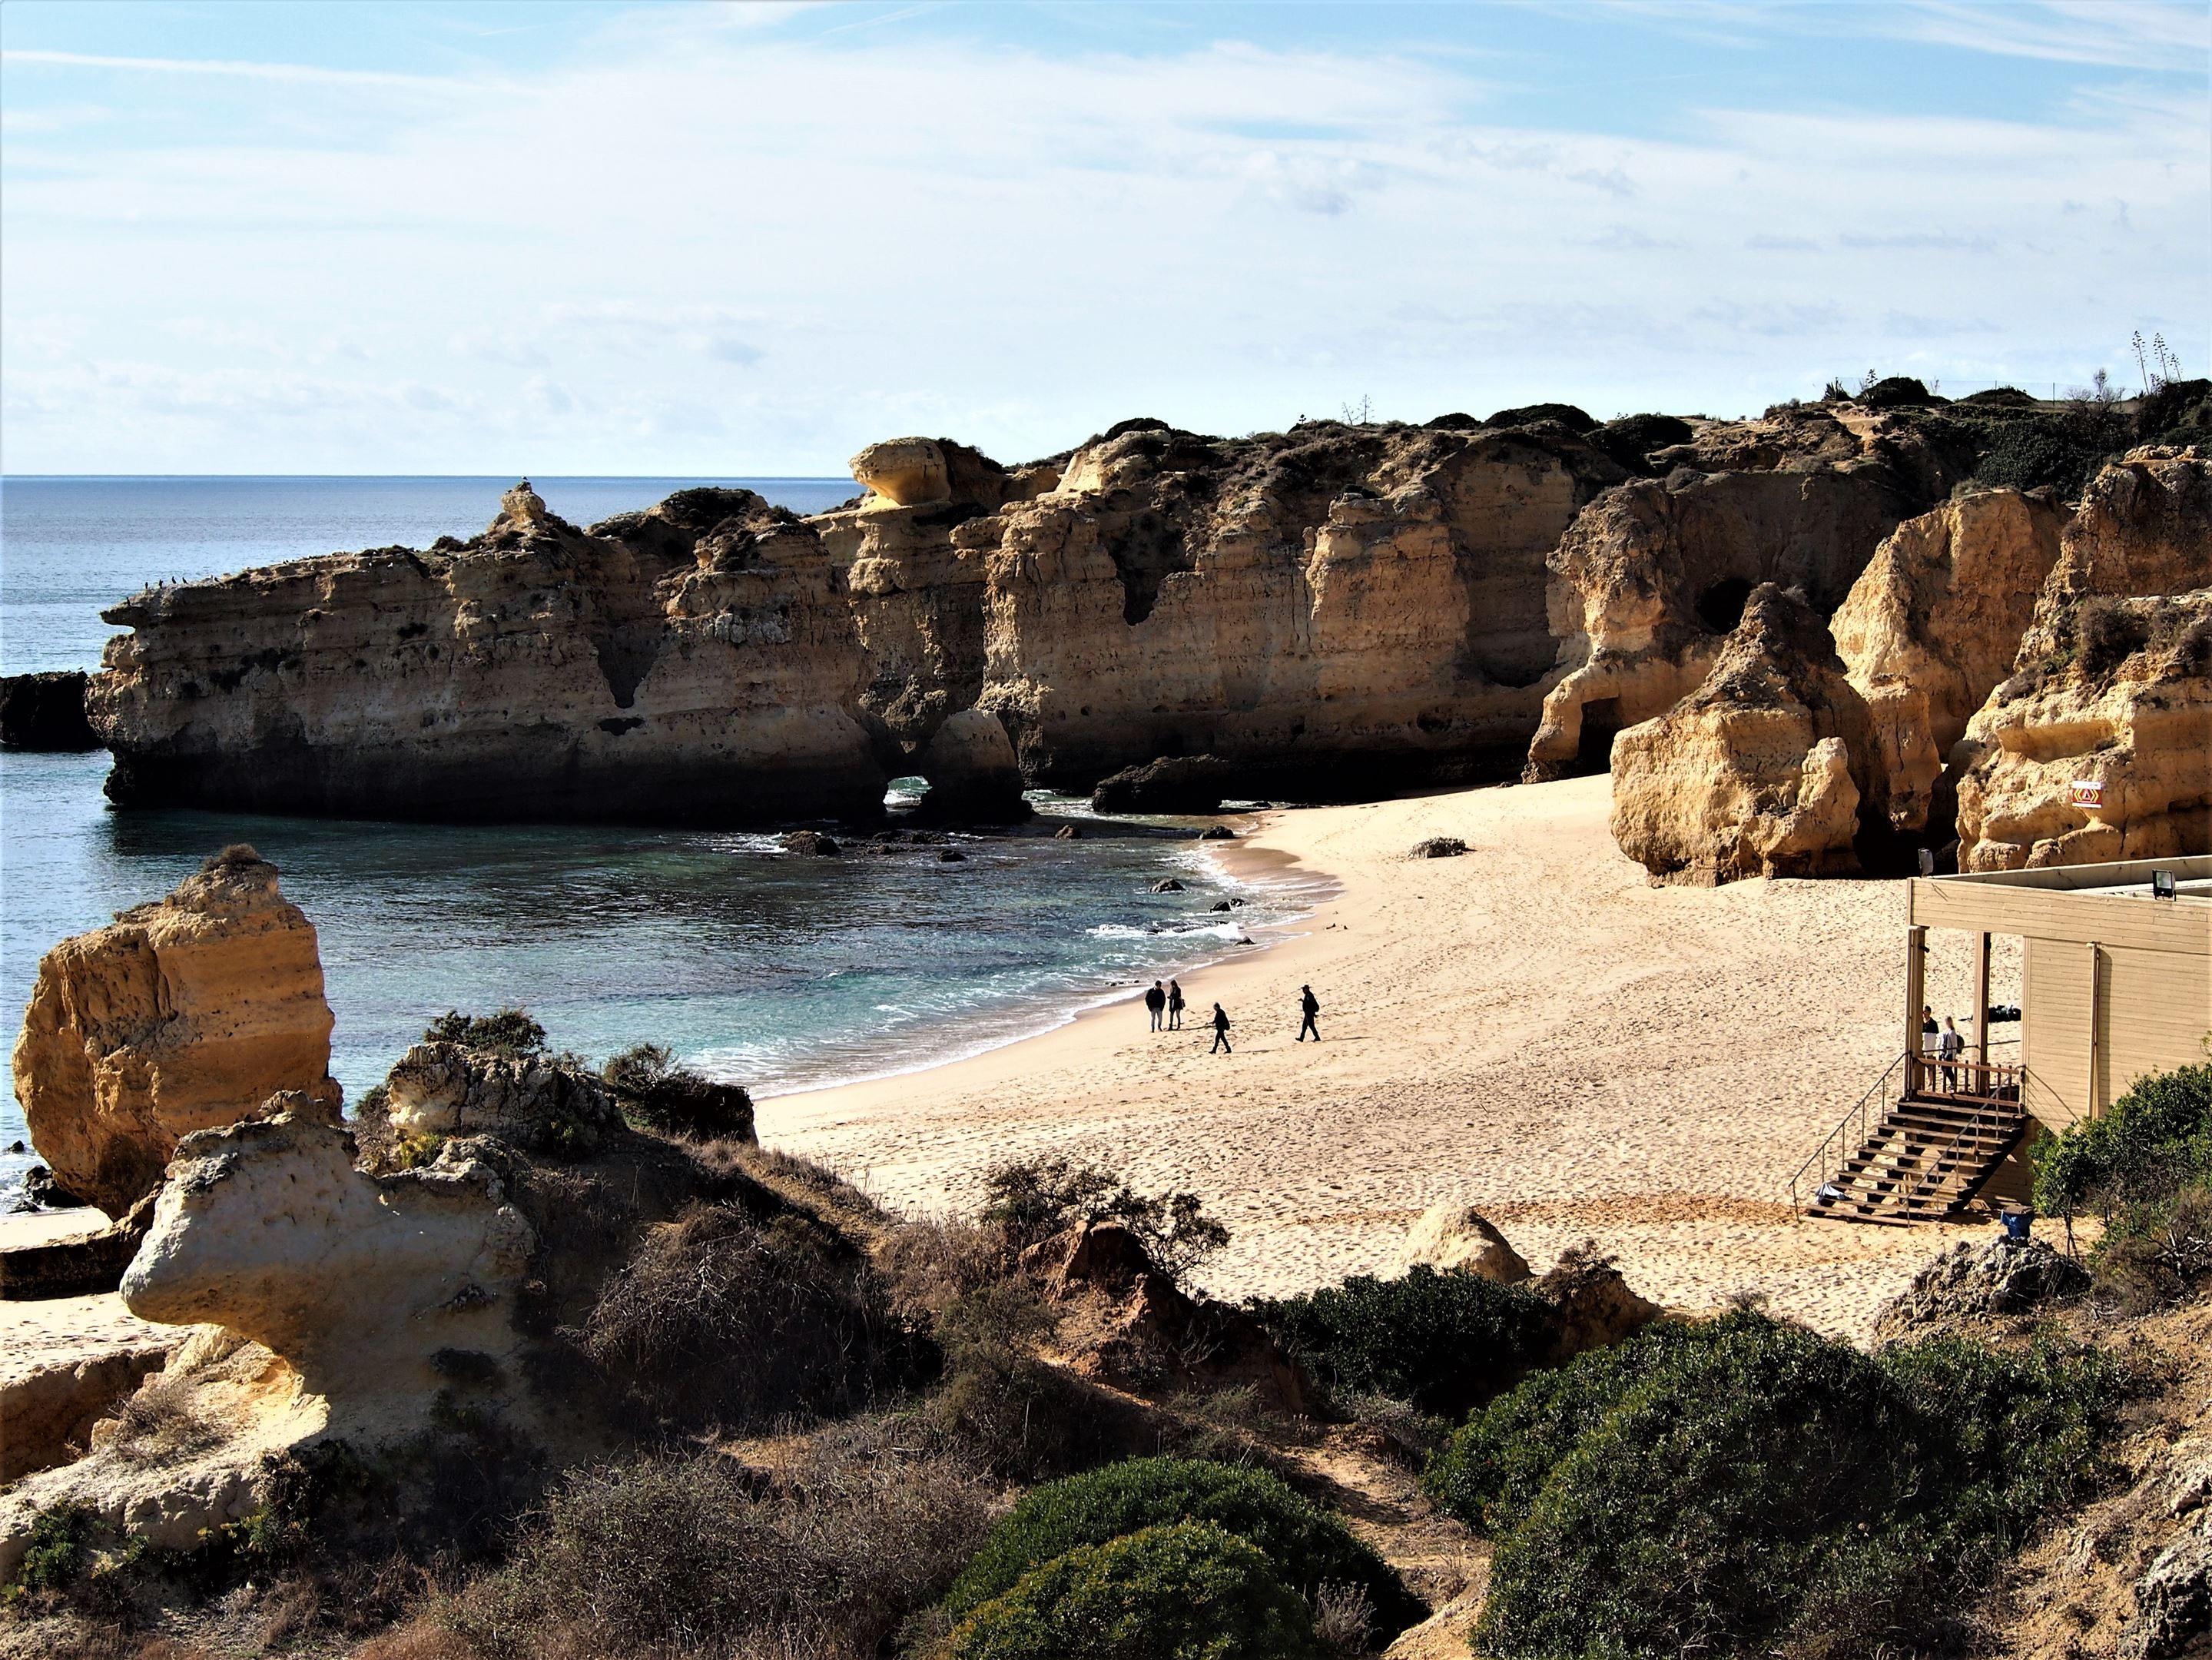 Praia de São Rafael, on the western side of Albufeira